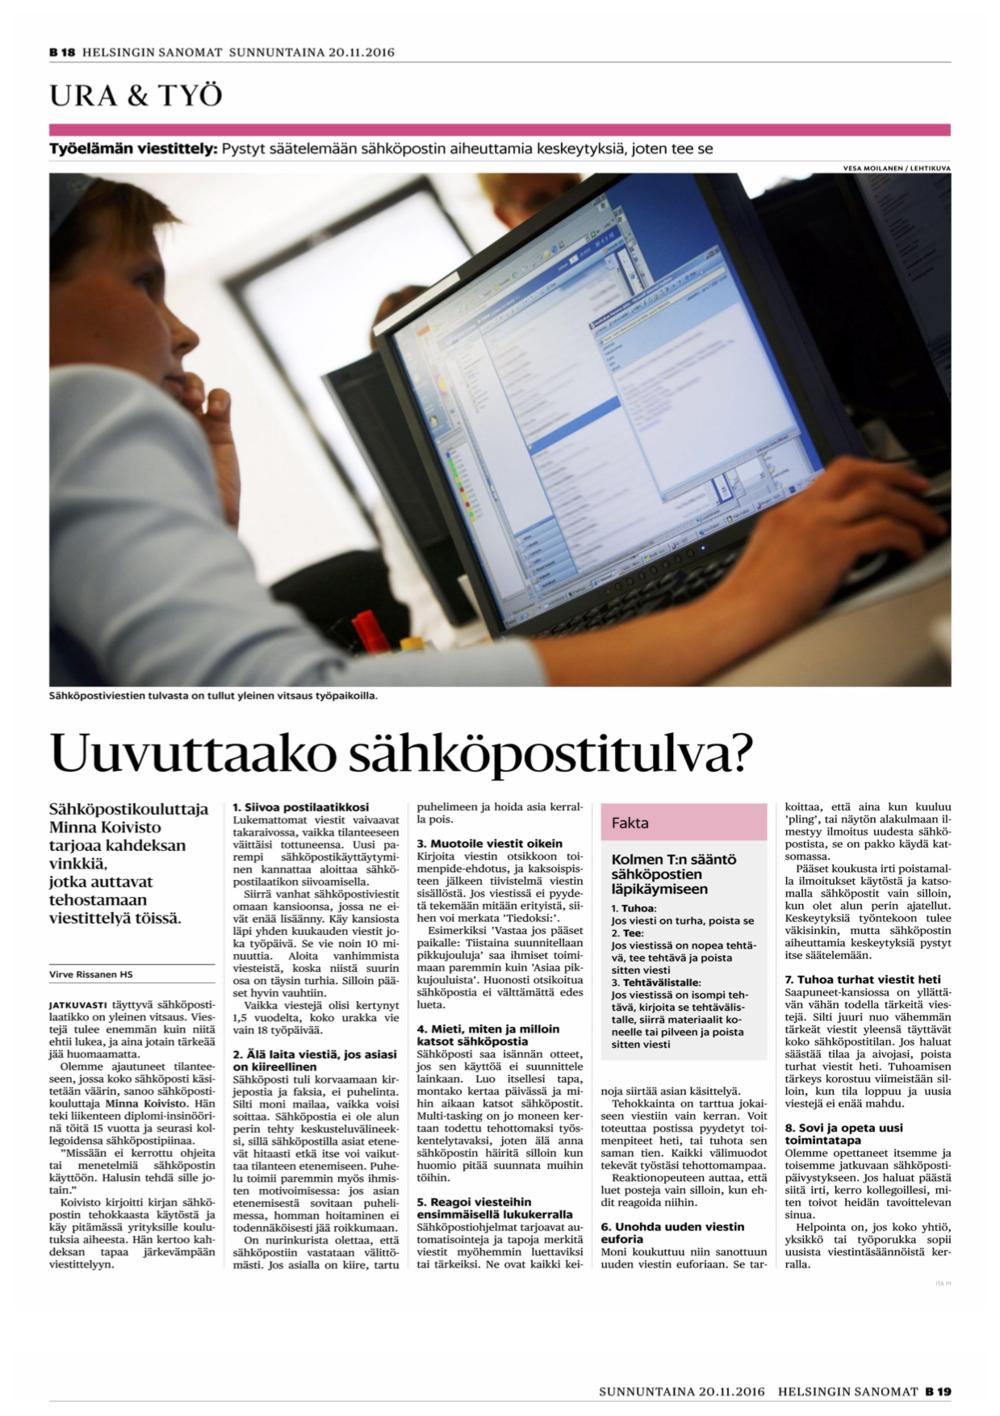 Helsingin Sanomat 20.11.2016